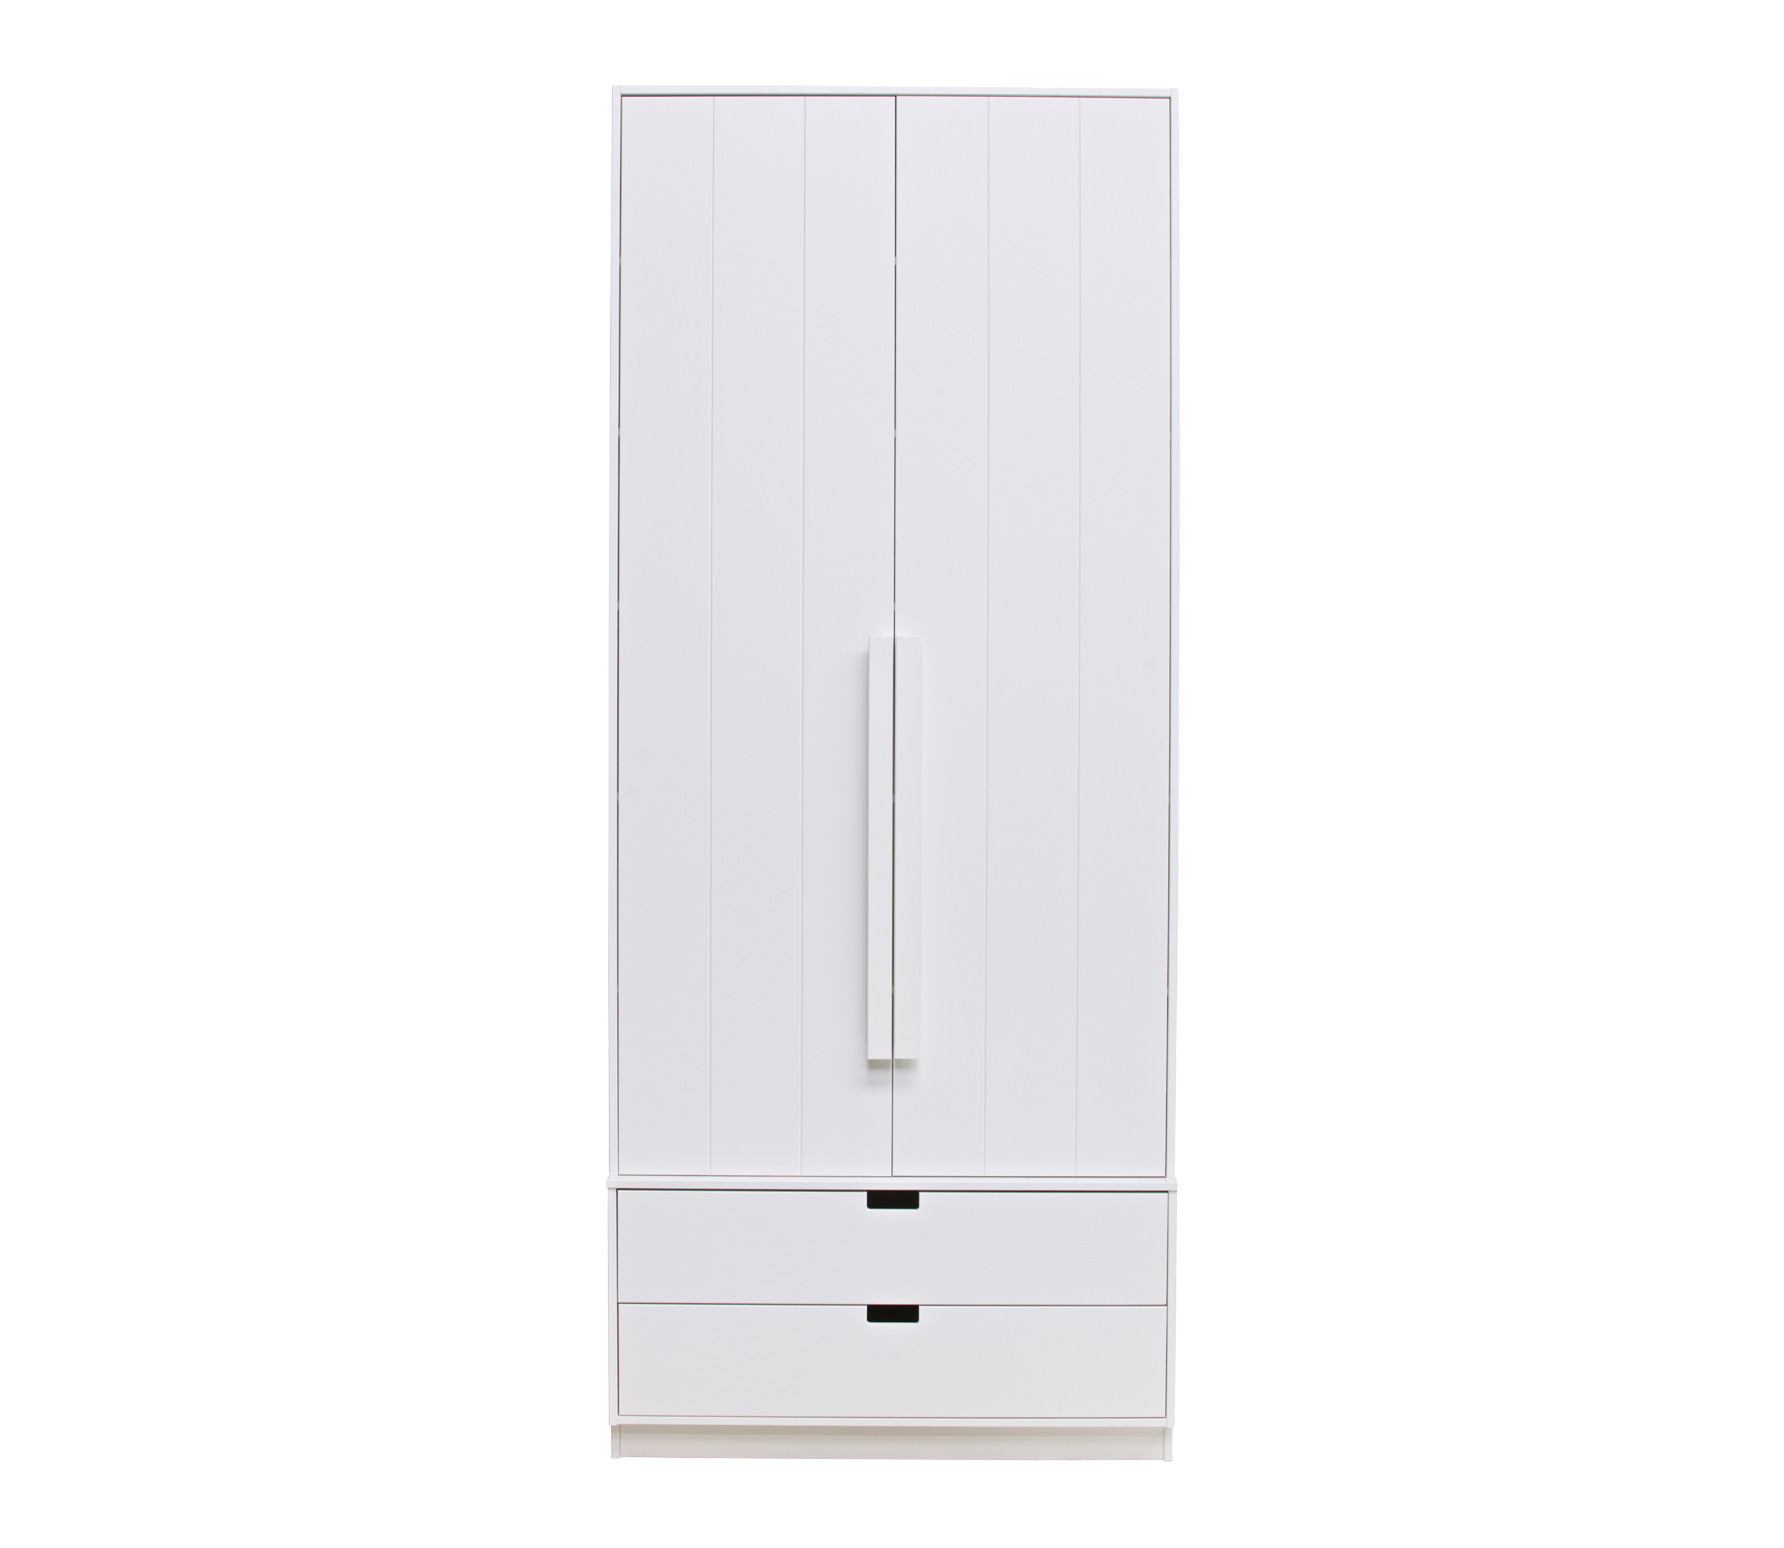 Basiclabel SKIK kast variant 14 wit 231x95x62 cm massief grenen